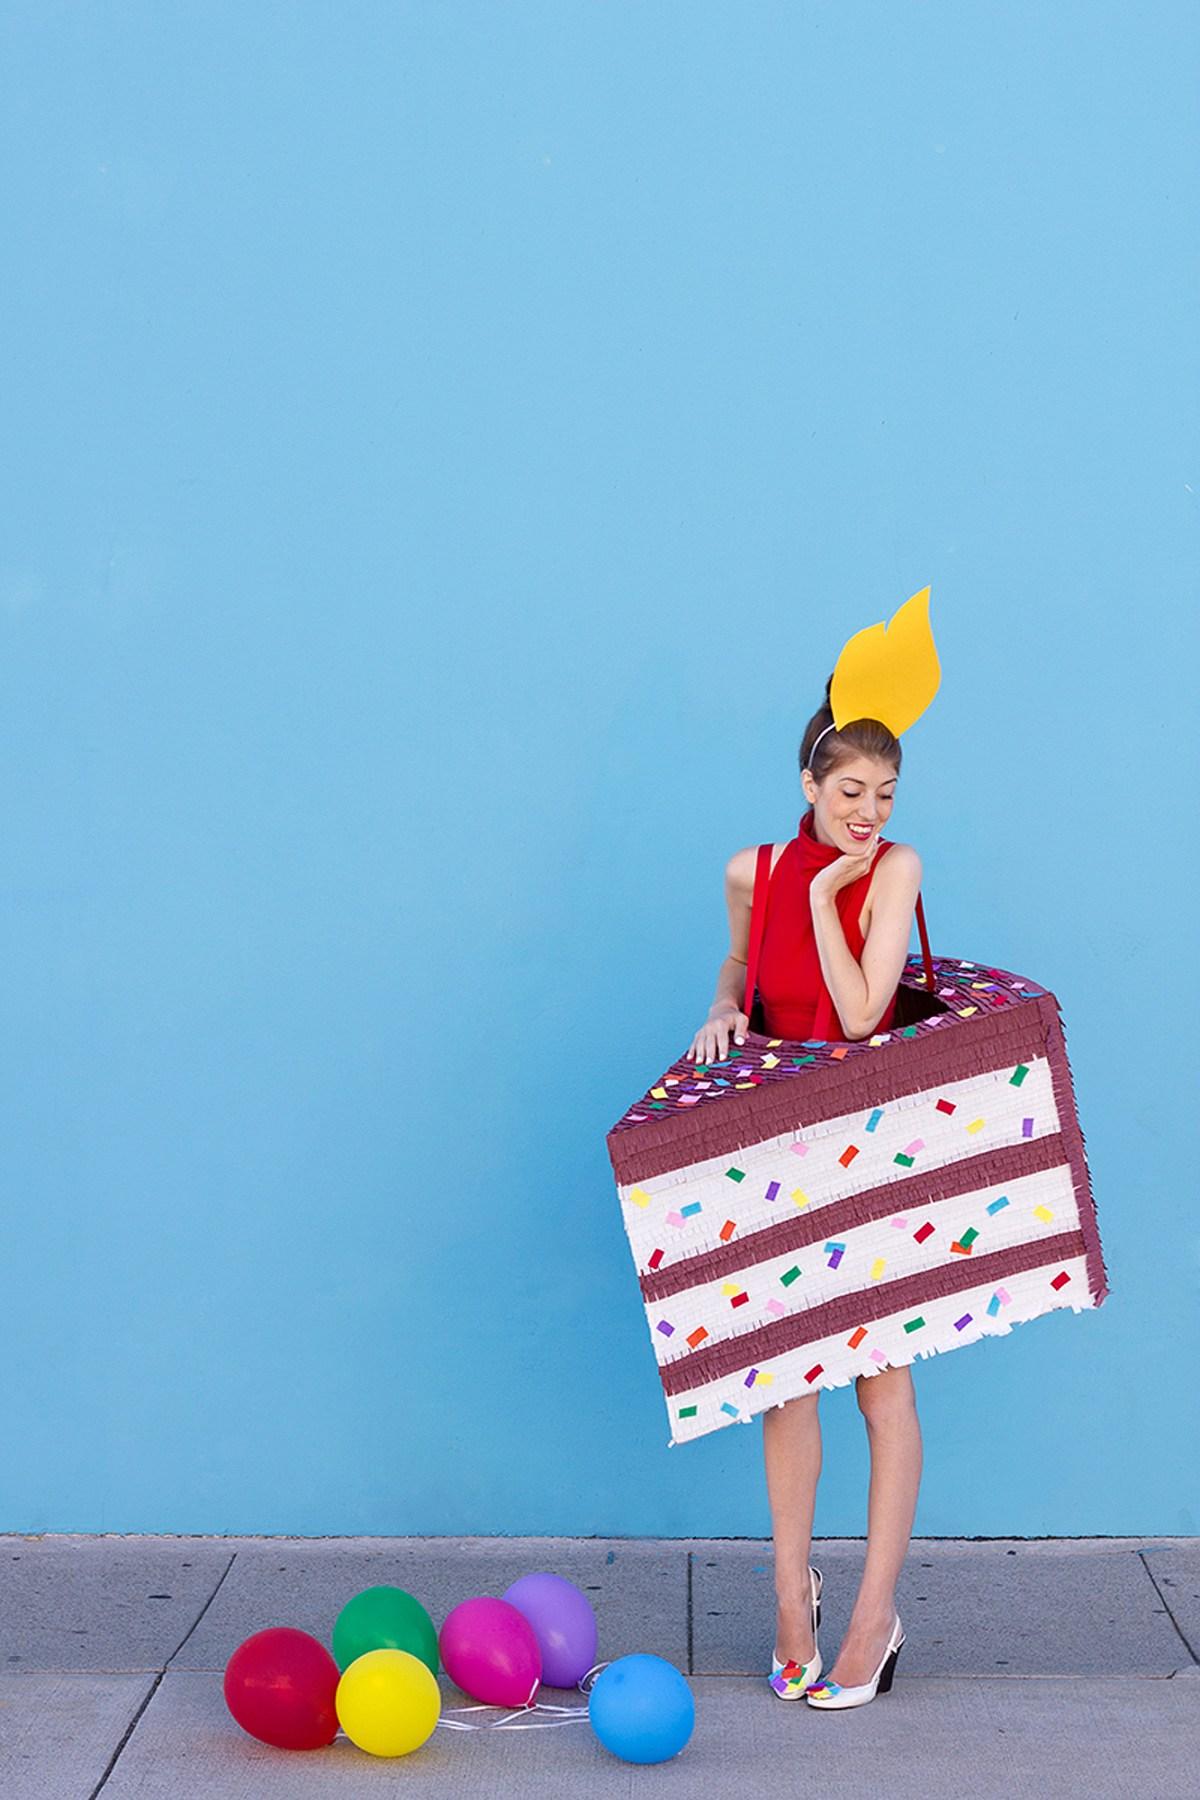 Delicious birthday cake slice DIY Tantalizing Food Costume Ideas To Have Tempting Halloween Celebration